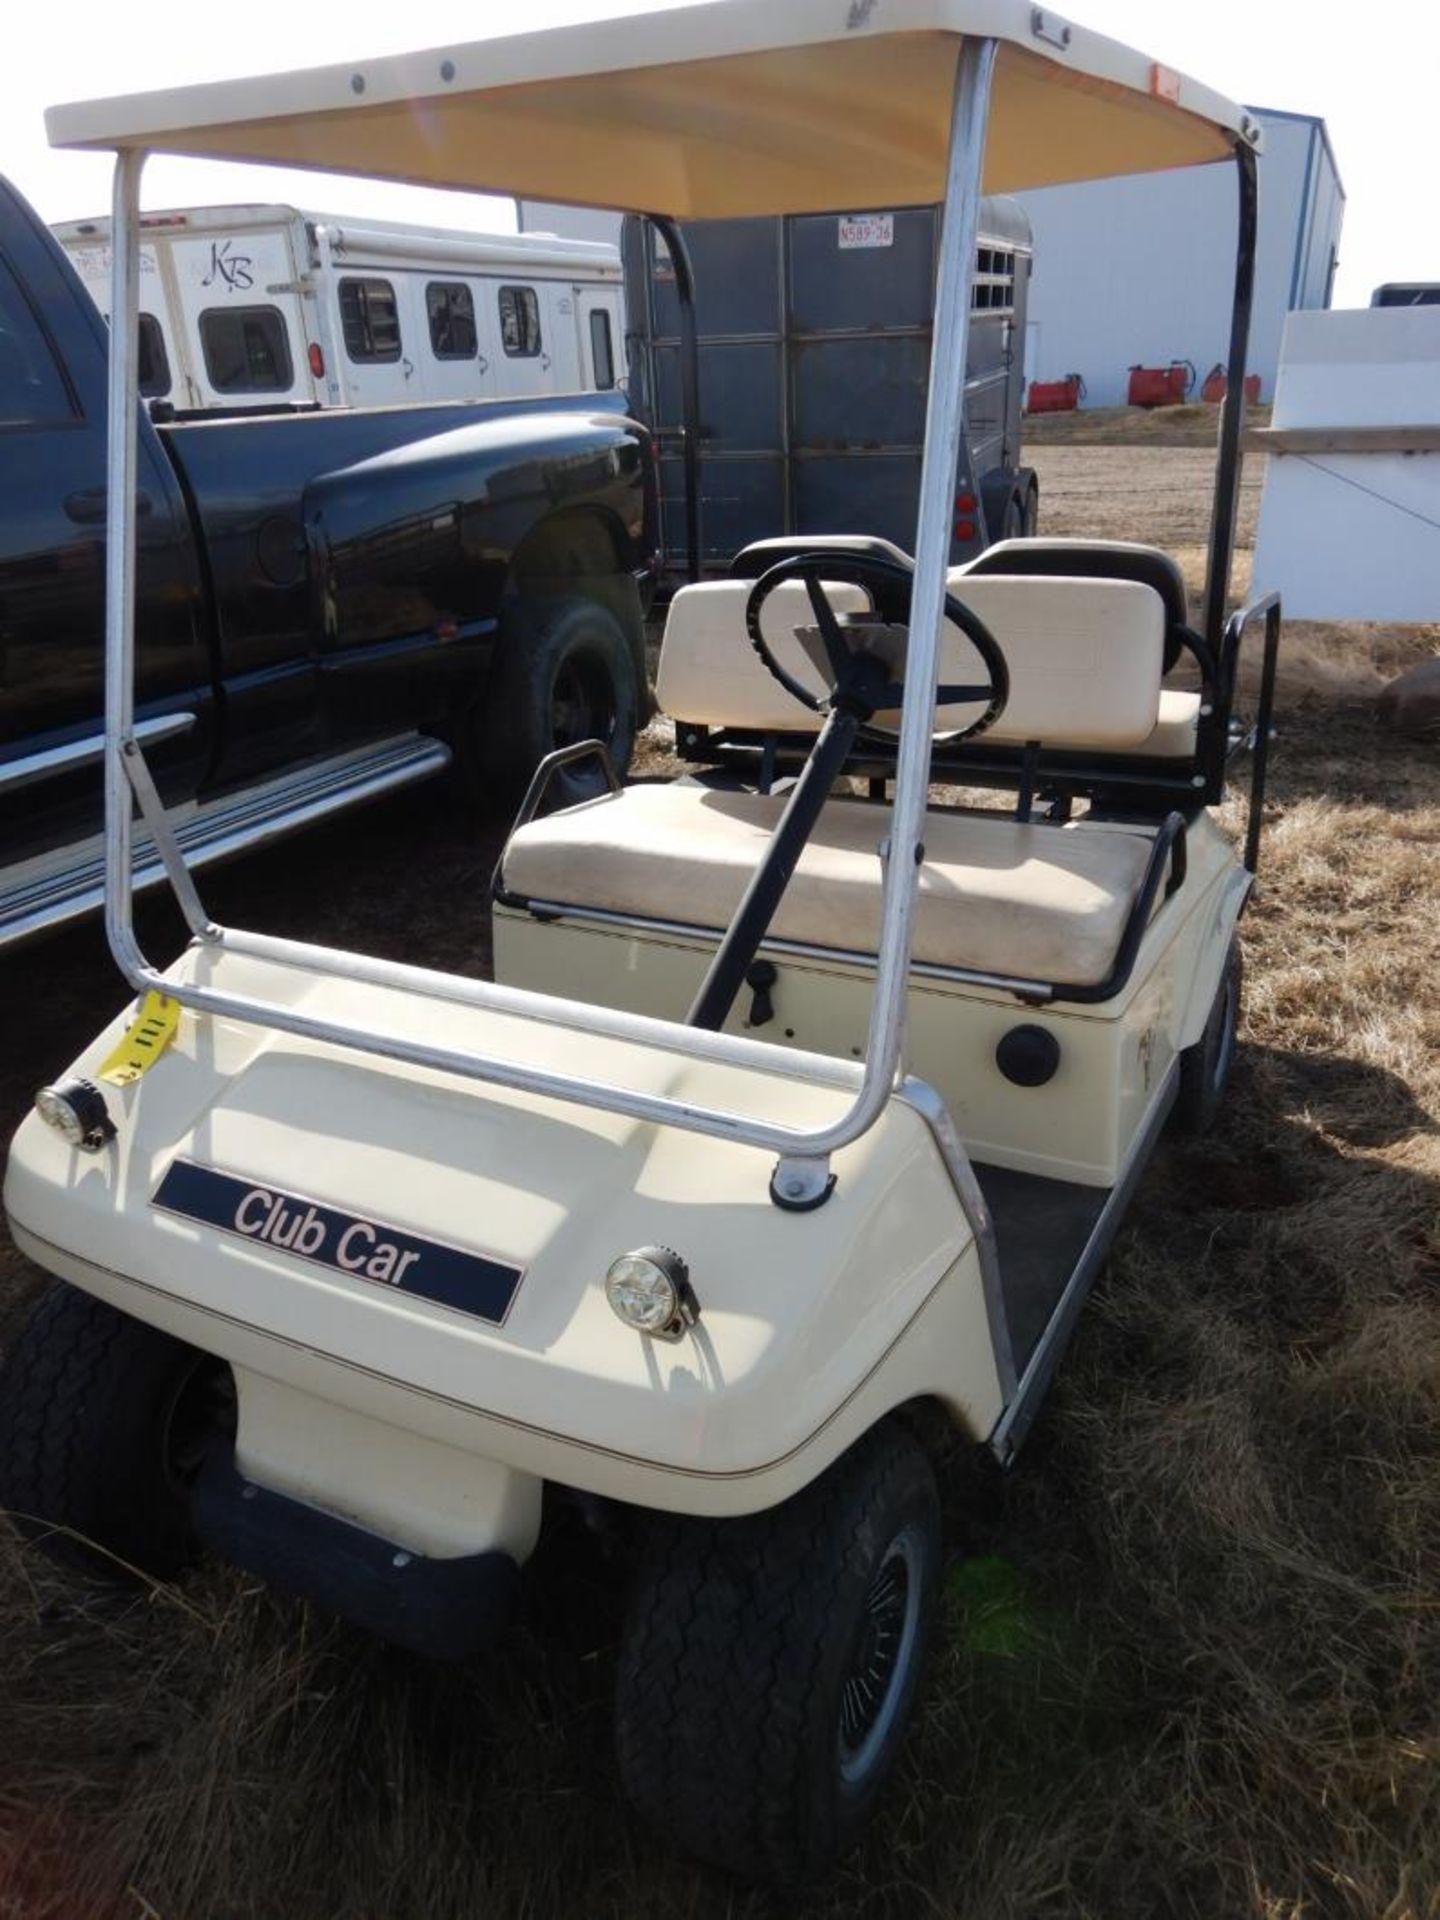 CLUB CAR GAS POWERED GOLF CART S/N AG9132254635 W/NEW BRAKES, BATTERY, REAR SEAT